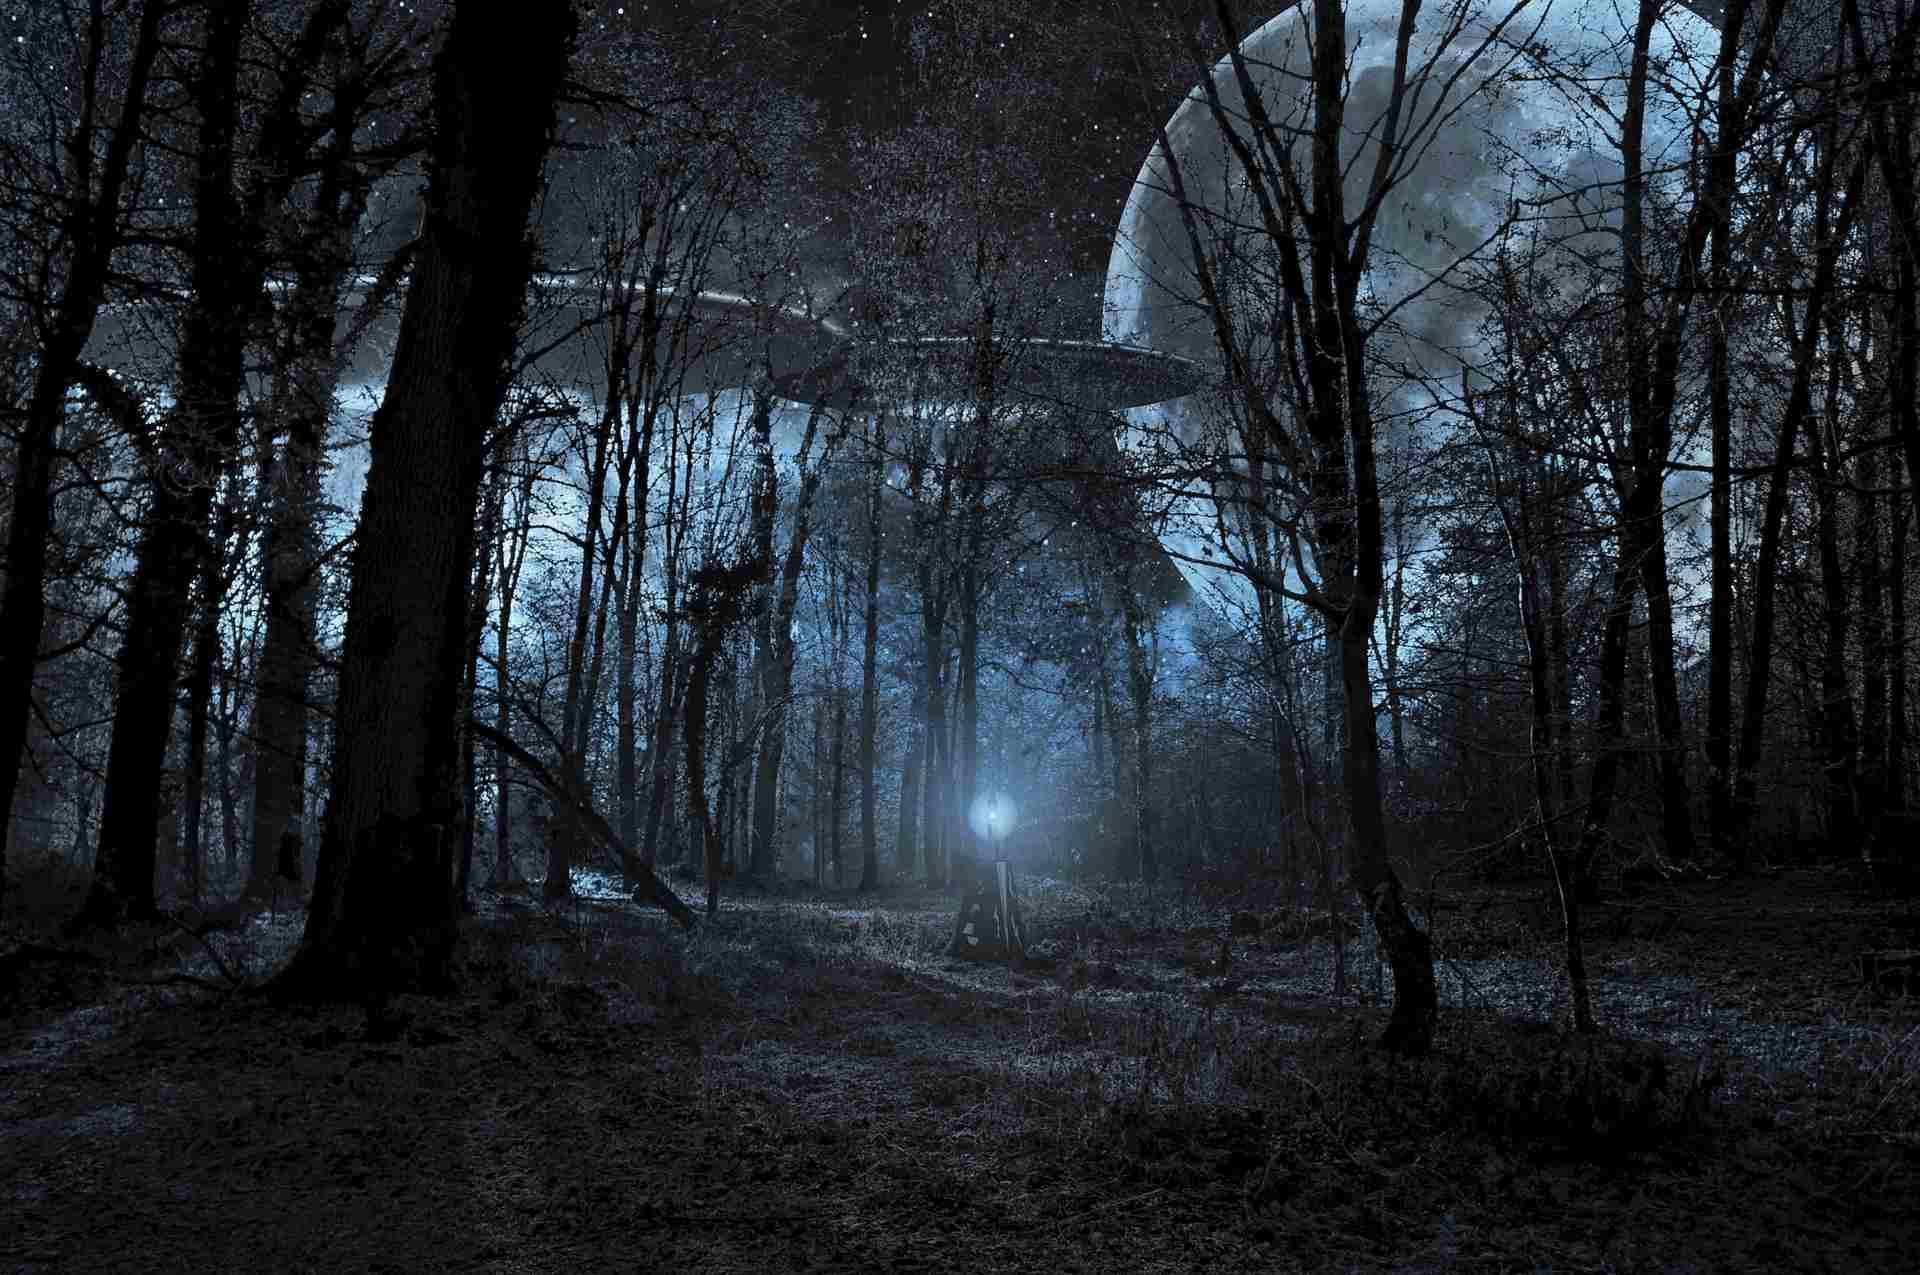 Artist rendering of alien spacecraft in a forest.